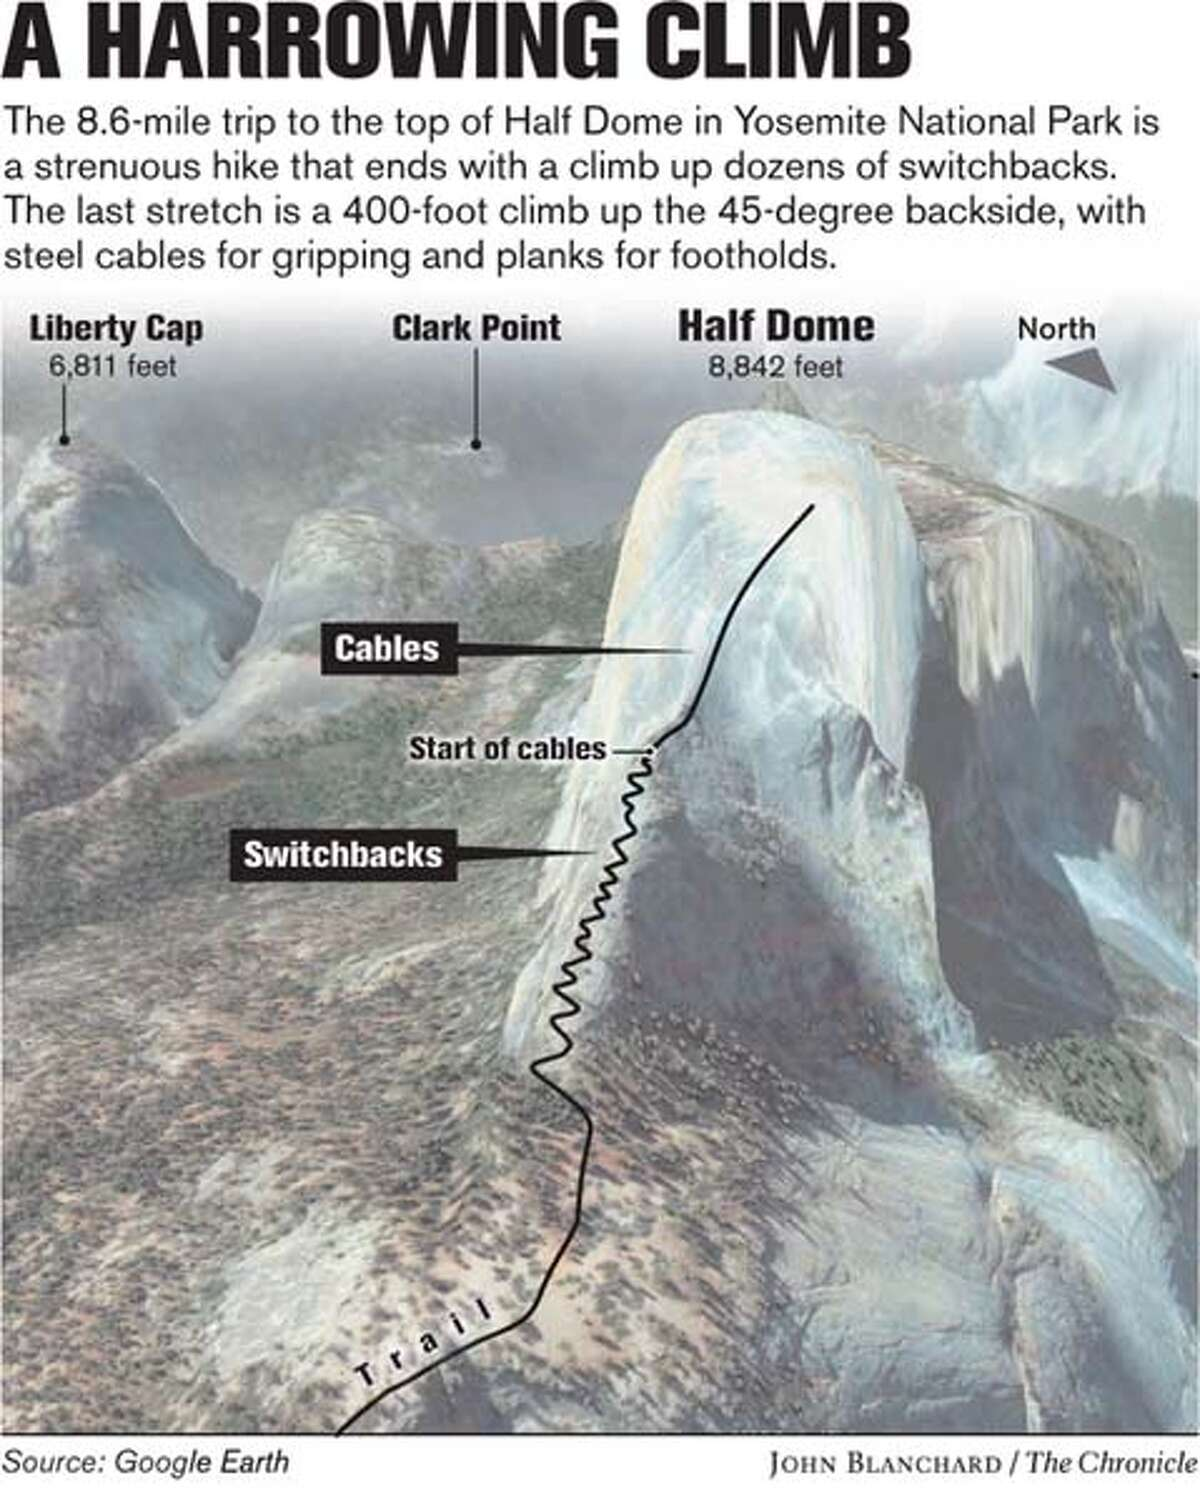 A Harrowing Climb. Chronicle graphic by John Blanchard